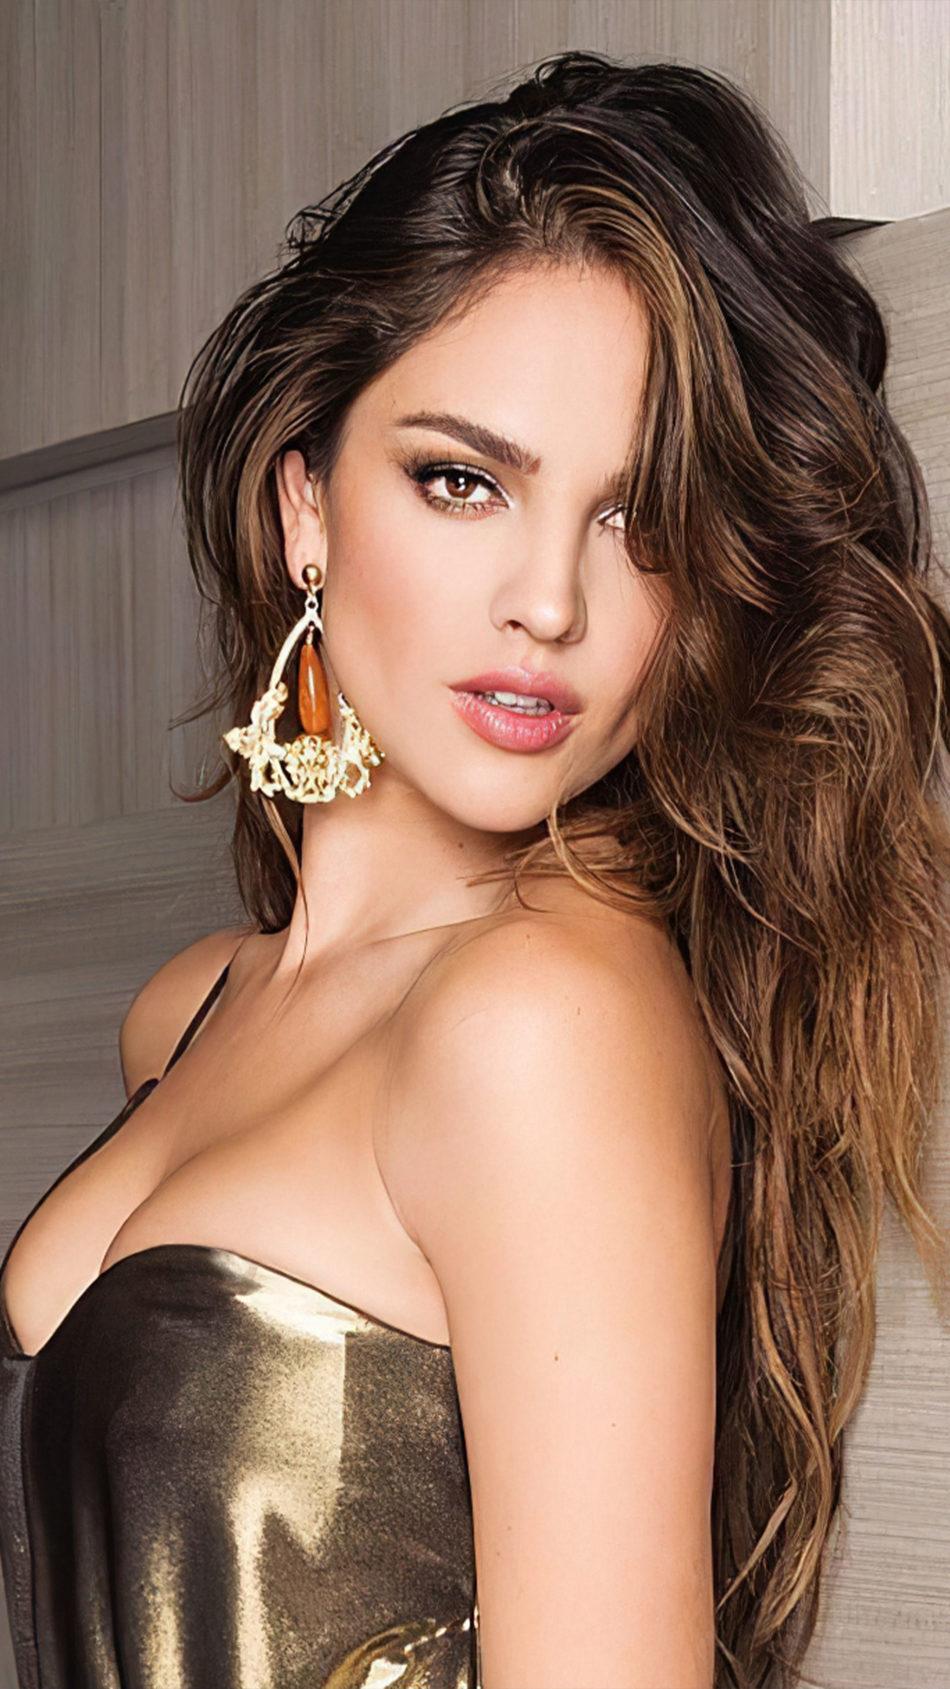 Beautiful Actress Eiza Gonzalez Photoshoot 4K Ultra HD Mobile Wallpaper